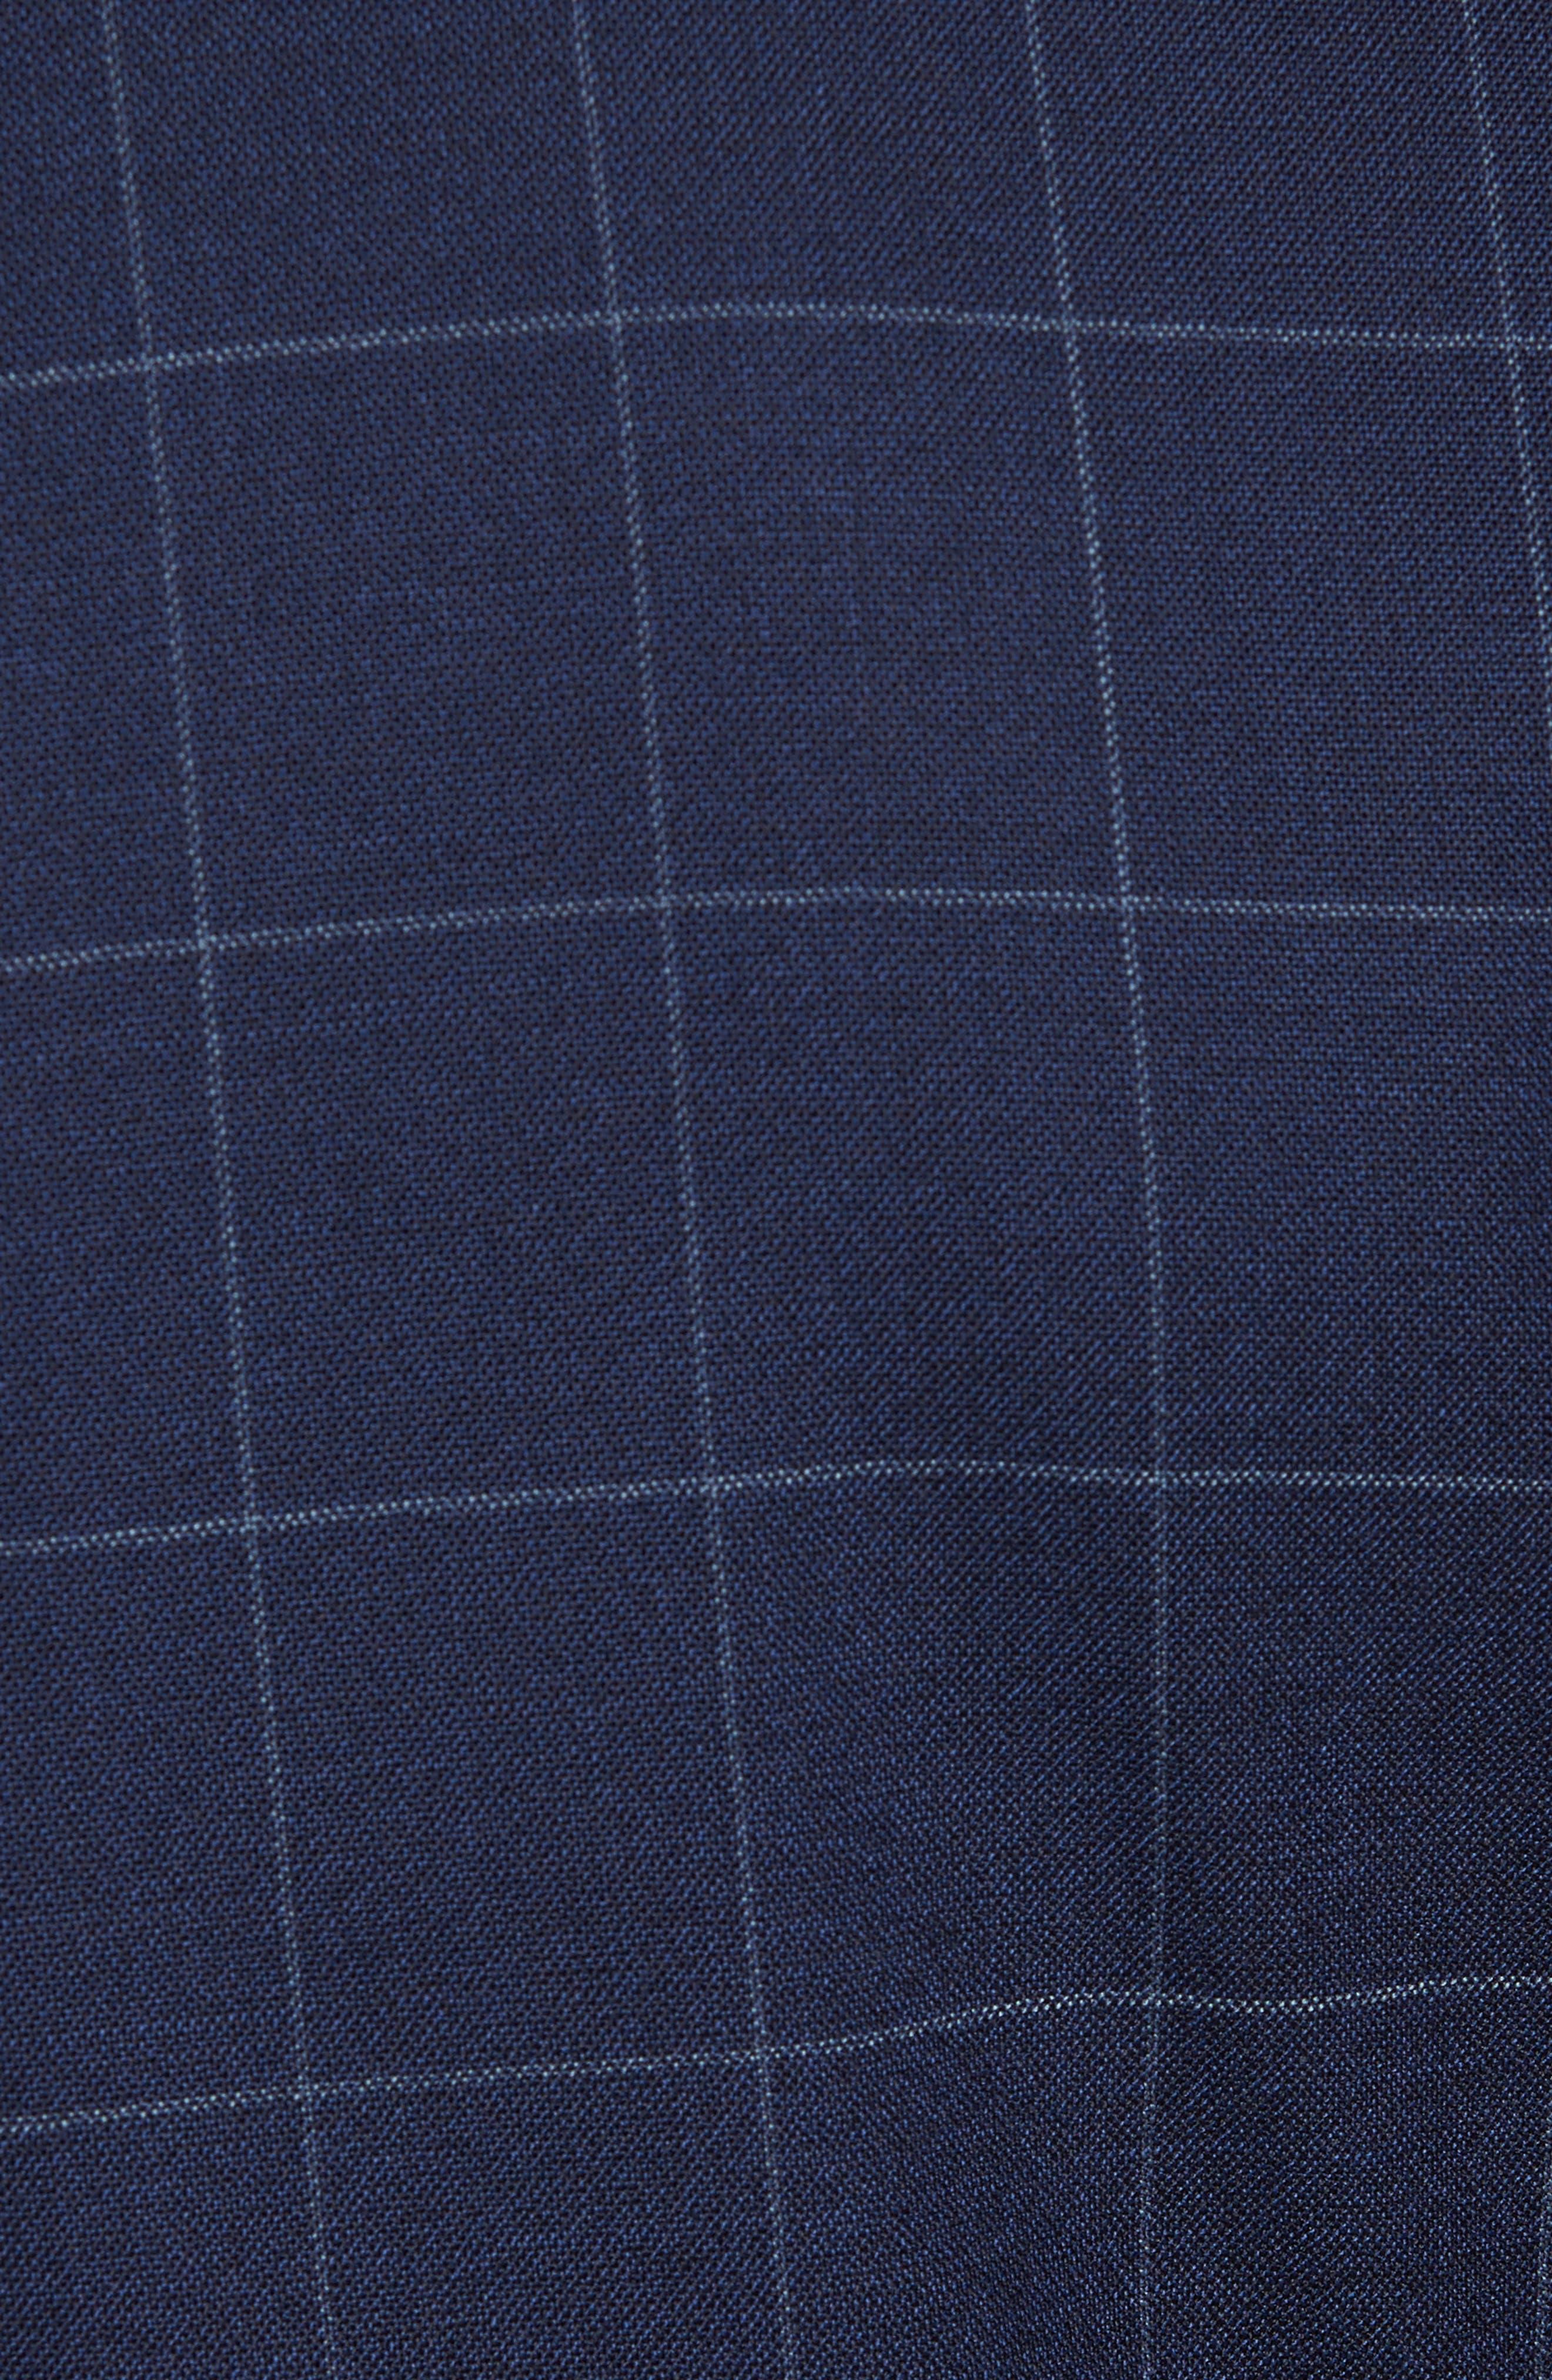 Huge/Genius Trim Fit Three Piece Windowpane Wool Suit,                             Alternate thumbnail 8, color,                             Navy